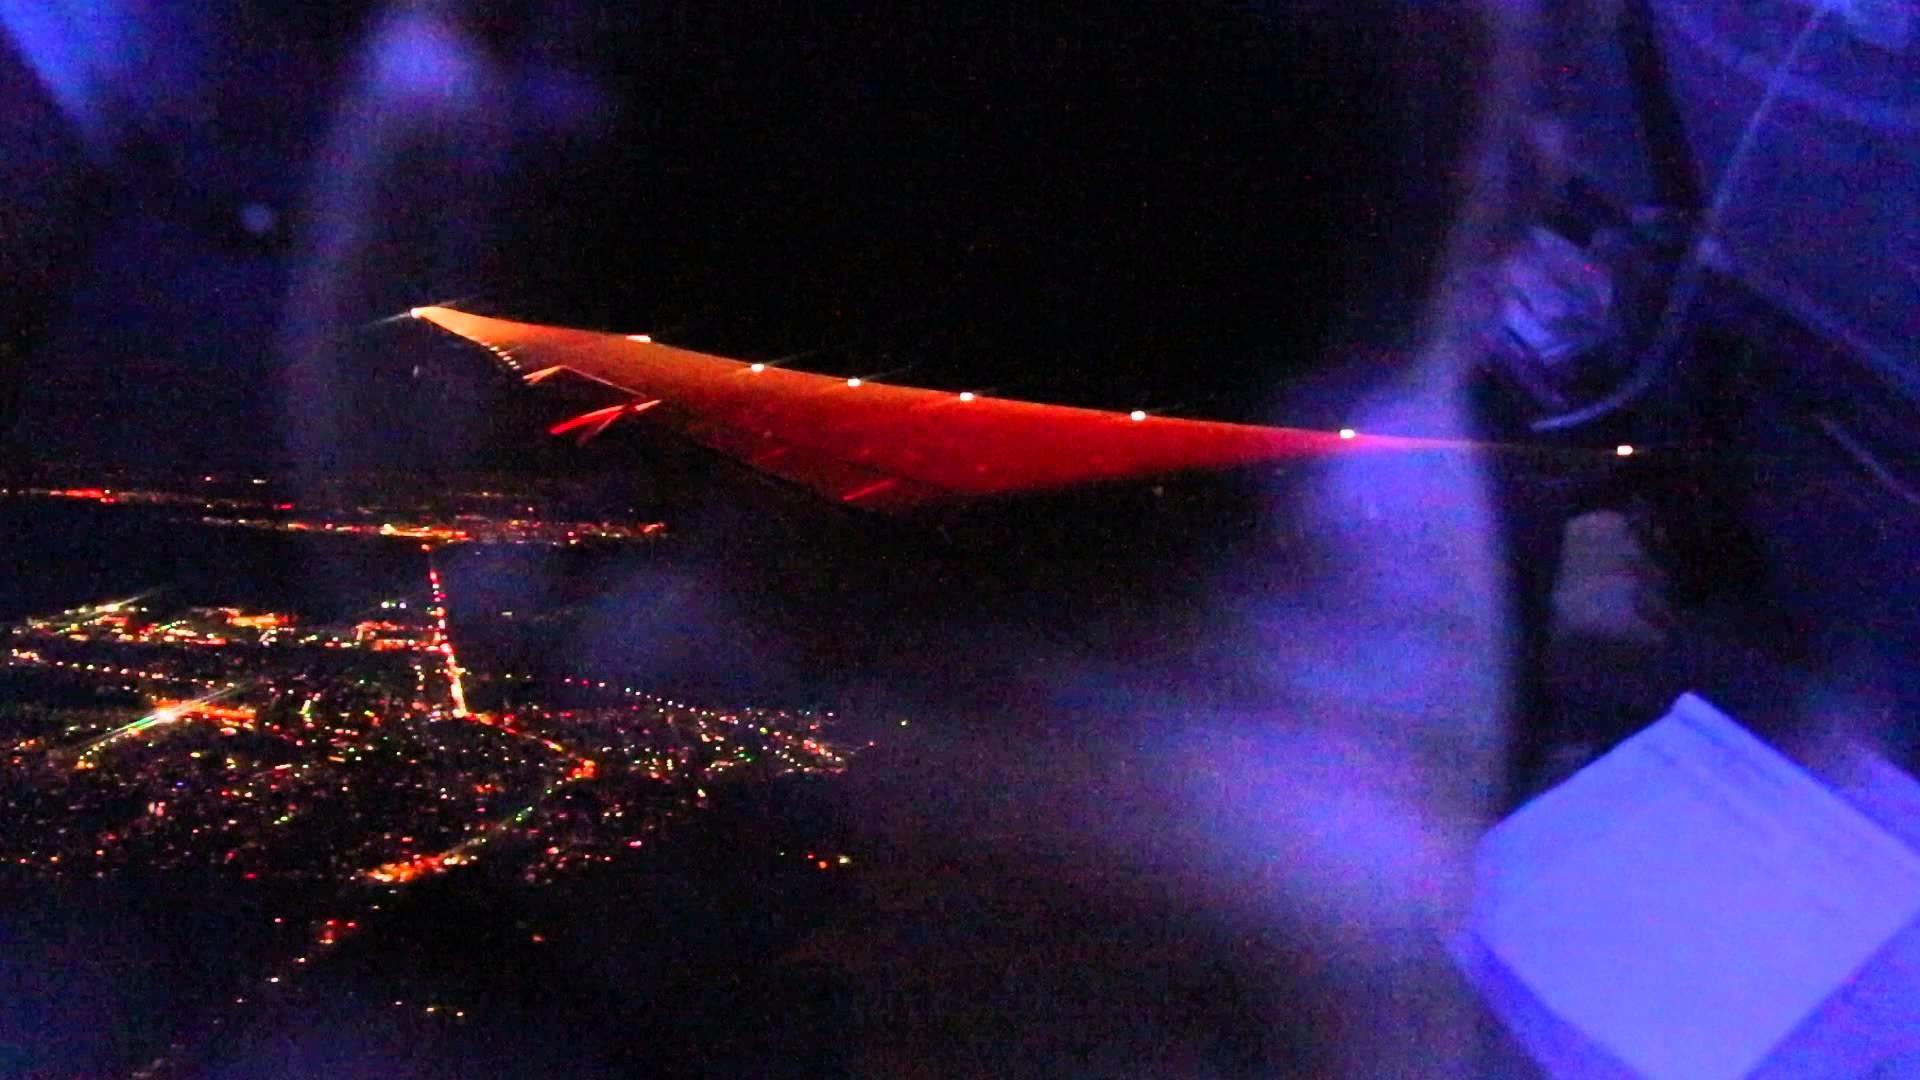 Boeing 787-8 night take-off from Frankfurt